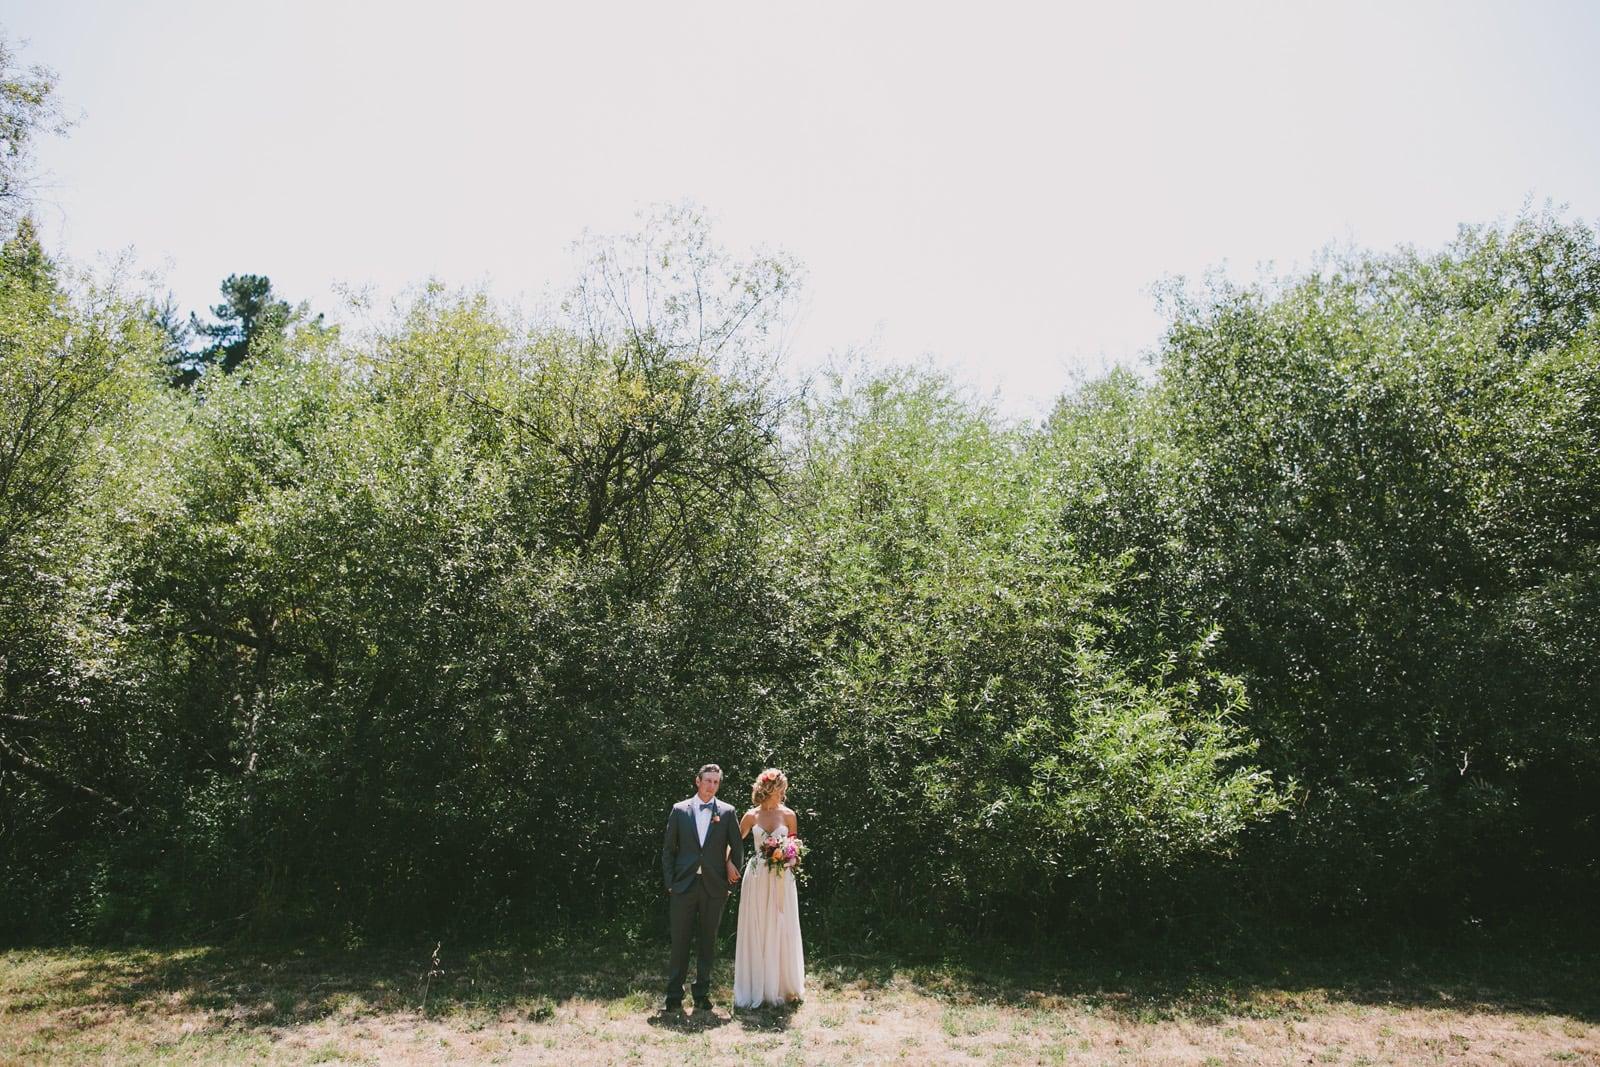 radonich_ranch_wedding_los_gatos_wedding_024